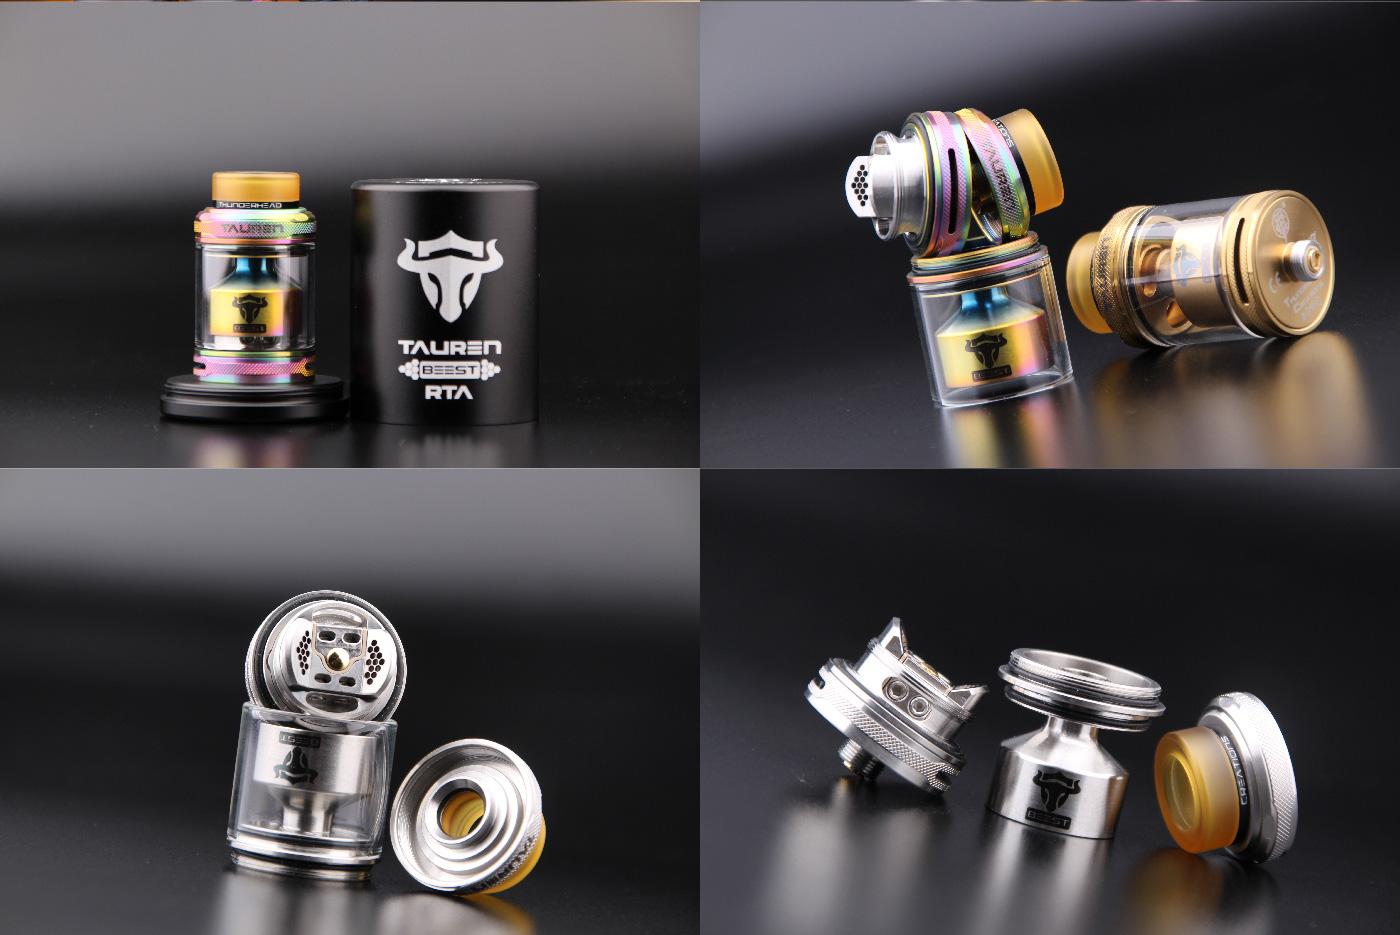 6c5520d3422cf1268c9f4063d0eebcf2 Thunder Head Creations Tauren RTA 2ml / 4.5ml Xsmokers